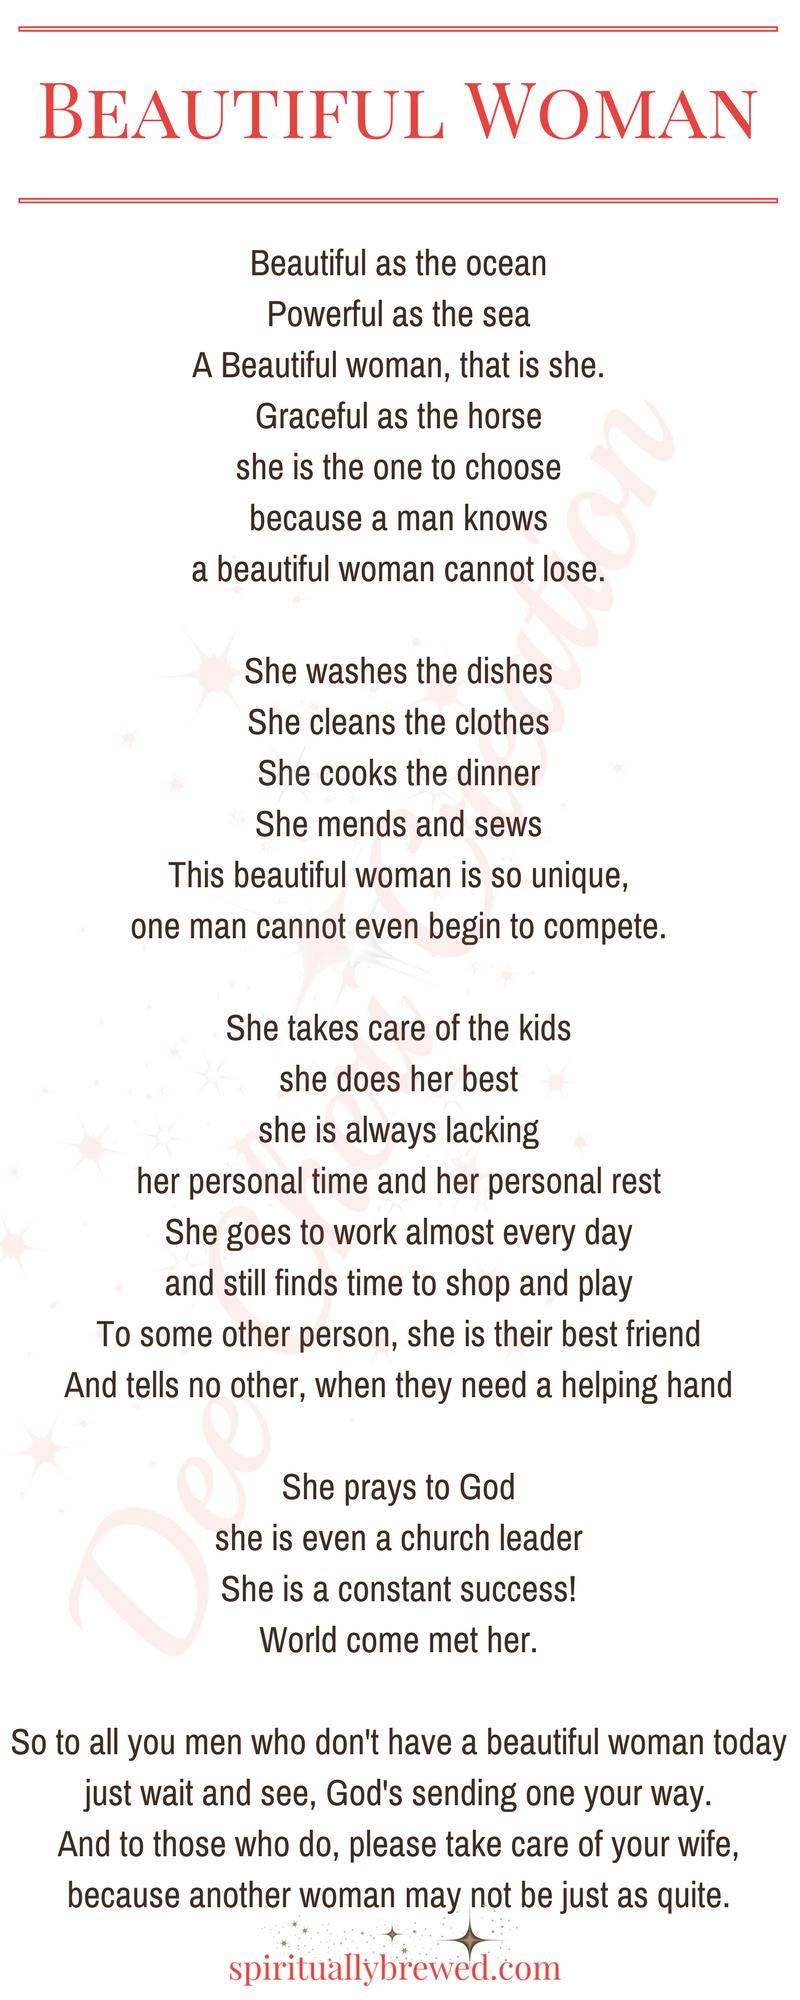 Poetry--Beautiful Woman | spirituallybrewed com | Women